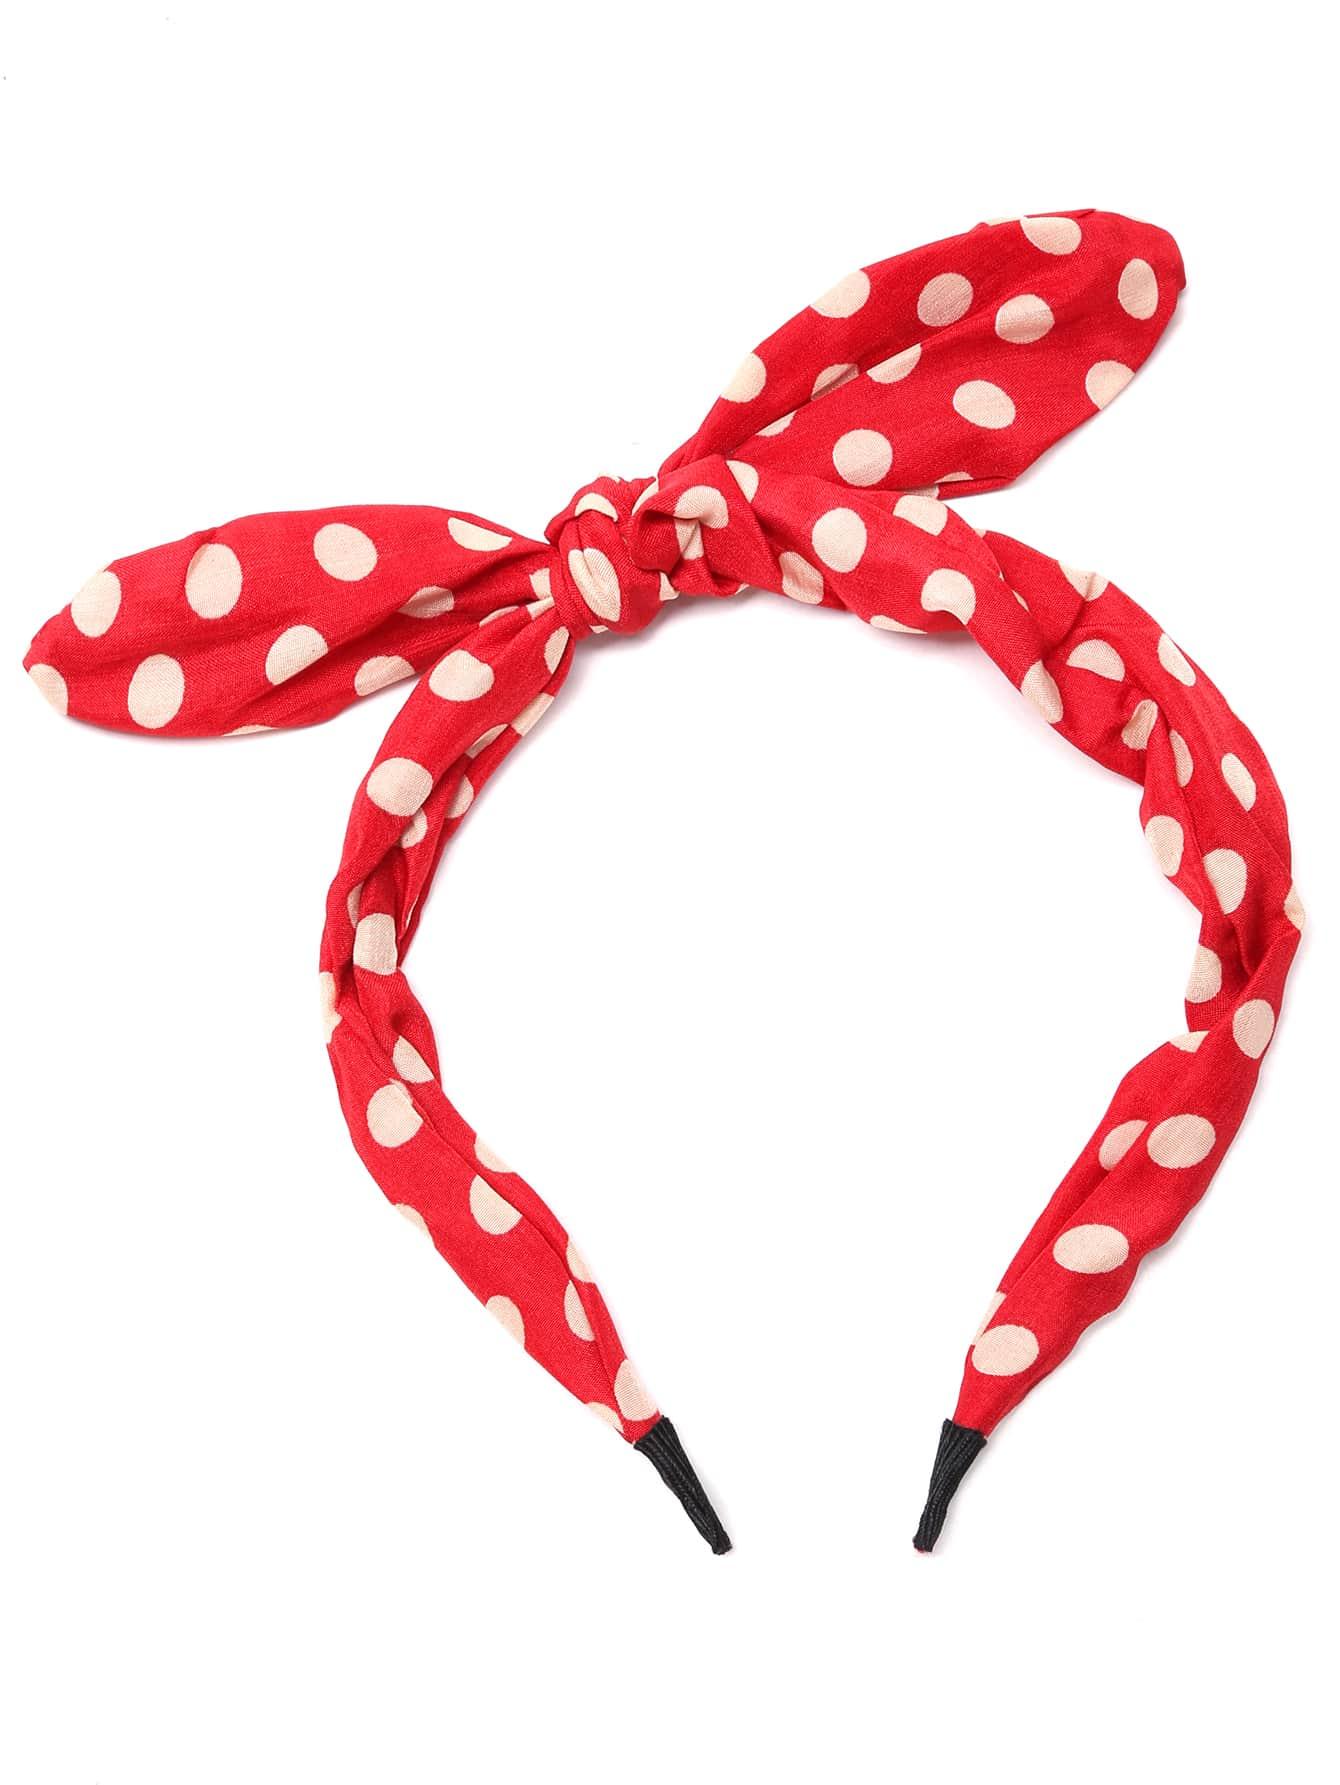 Red Polka Dot Rabbit Ear Design Bow Headband